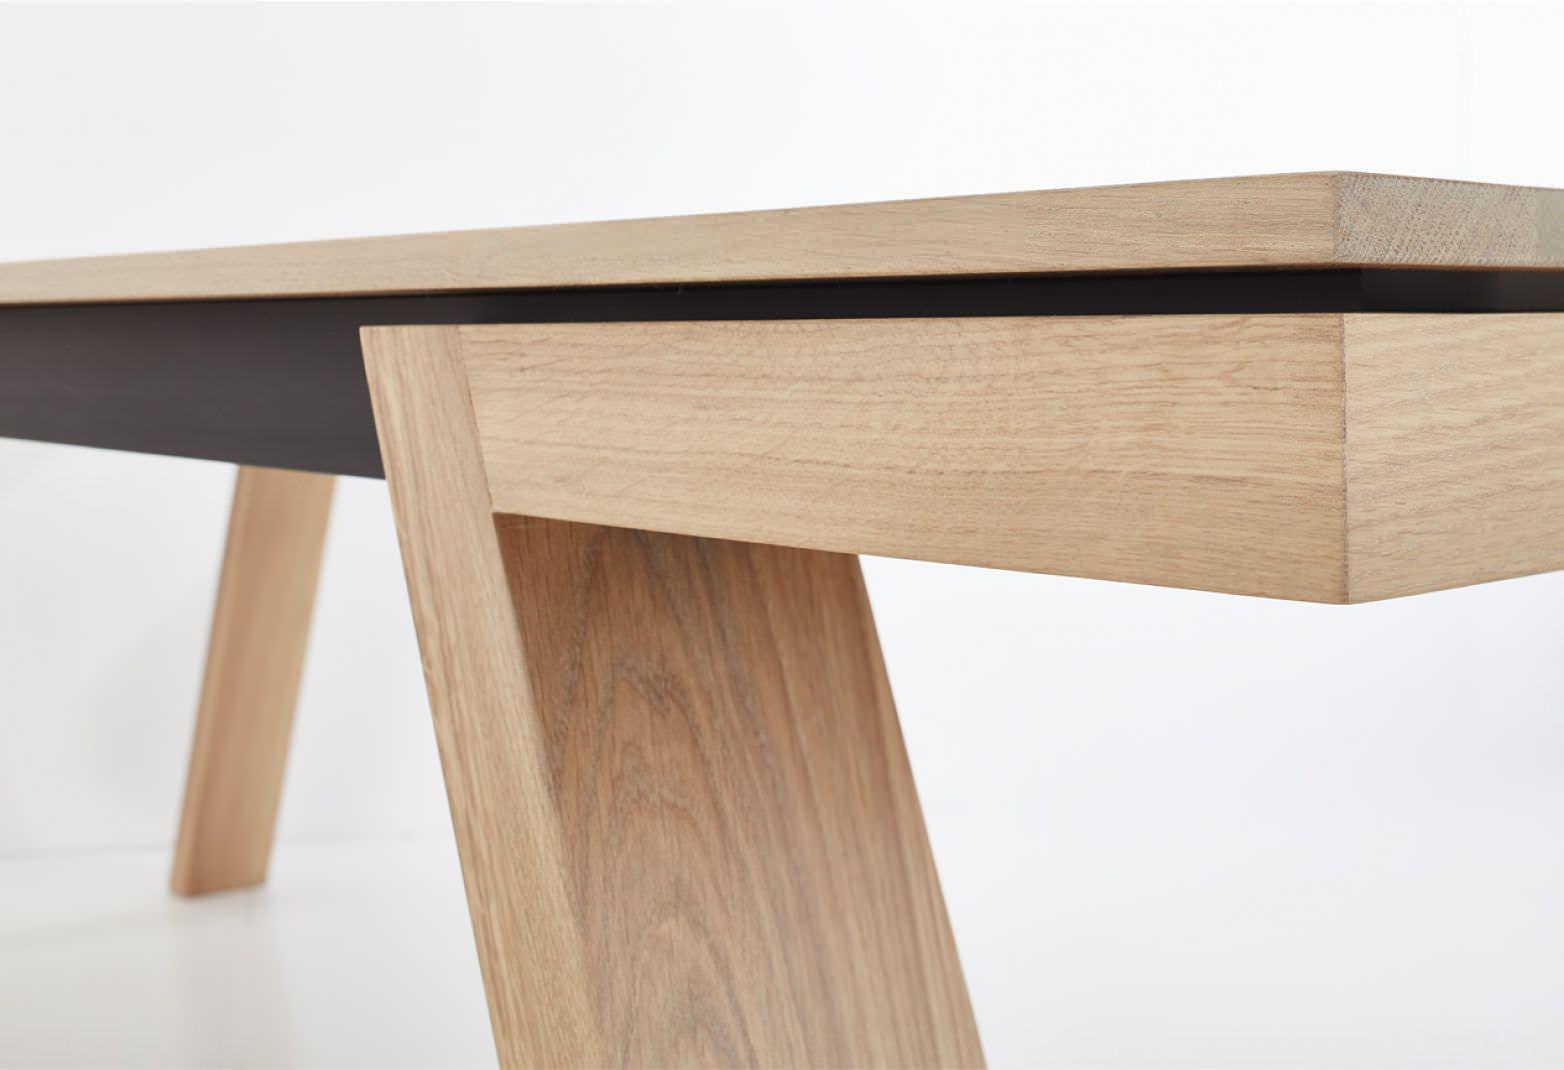 Esstisch modern design  Moderner Esstisch / Holz / rechteckig - SPRING by Kees Marcelis ...